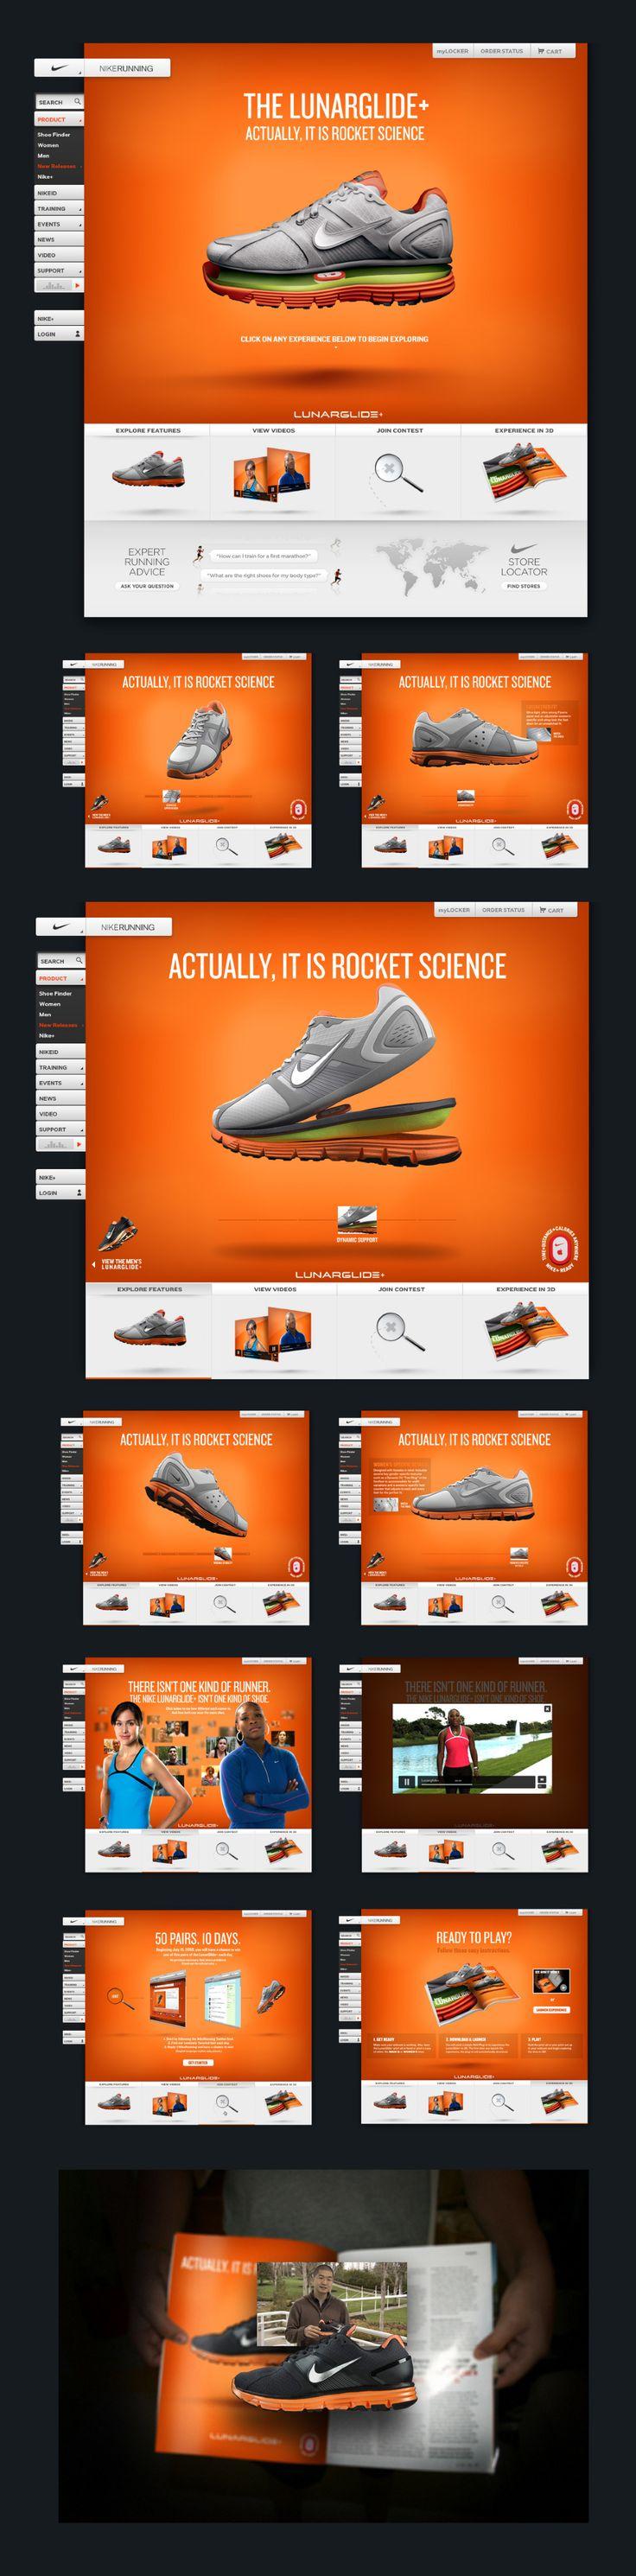 The #Nike LunarGlide+ - Diego Aguilar - Creative Direction #webdesign